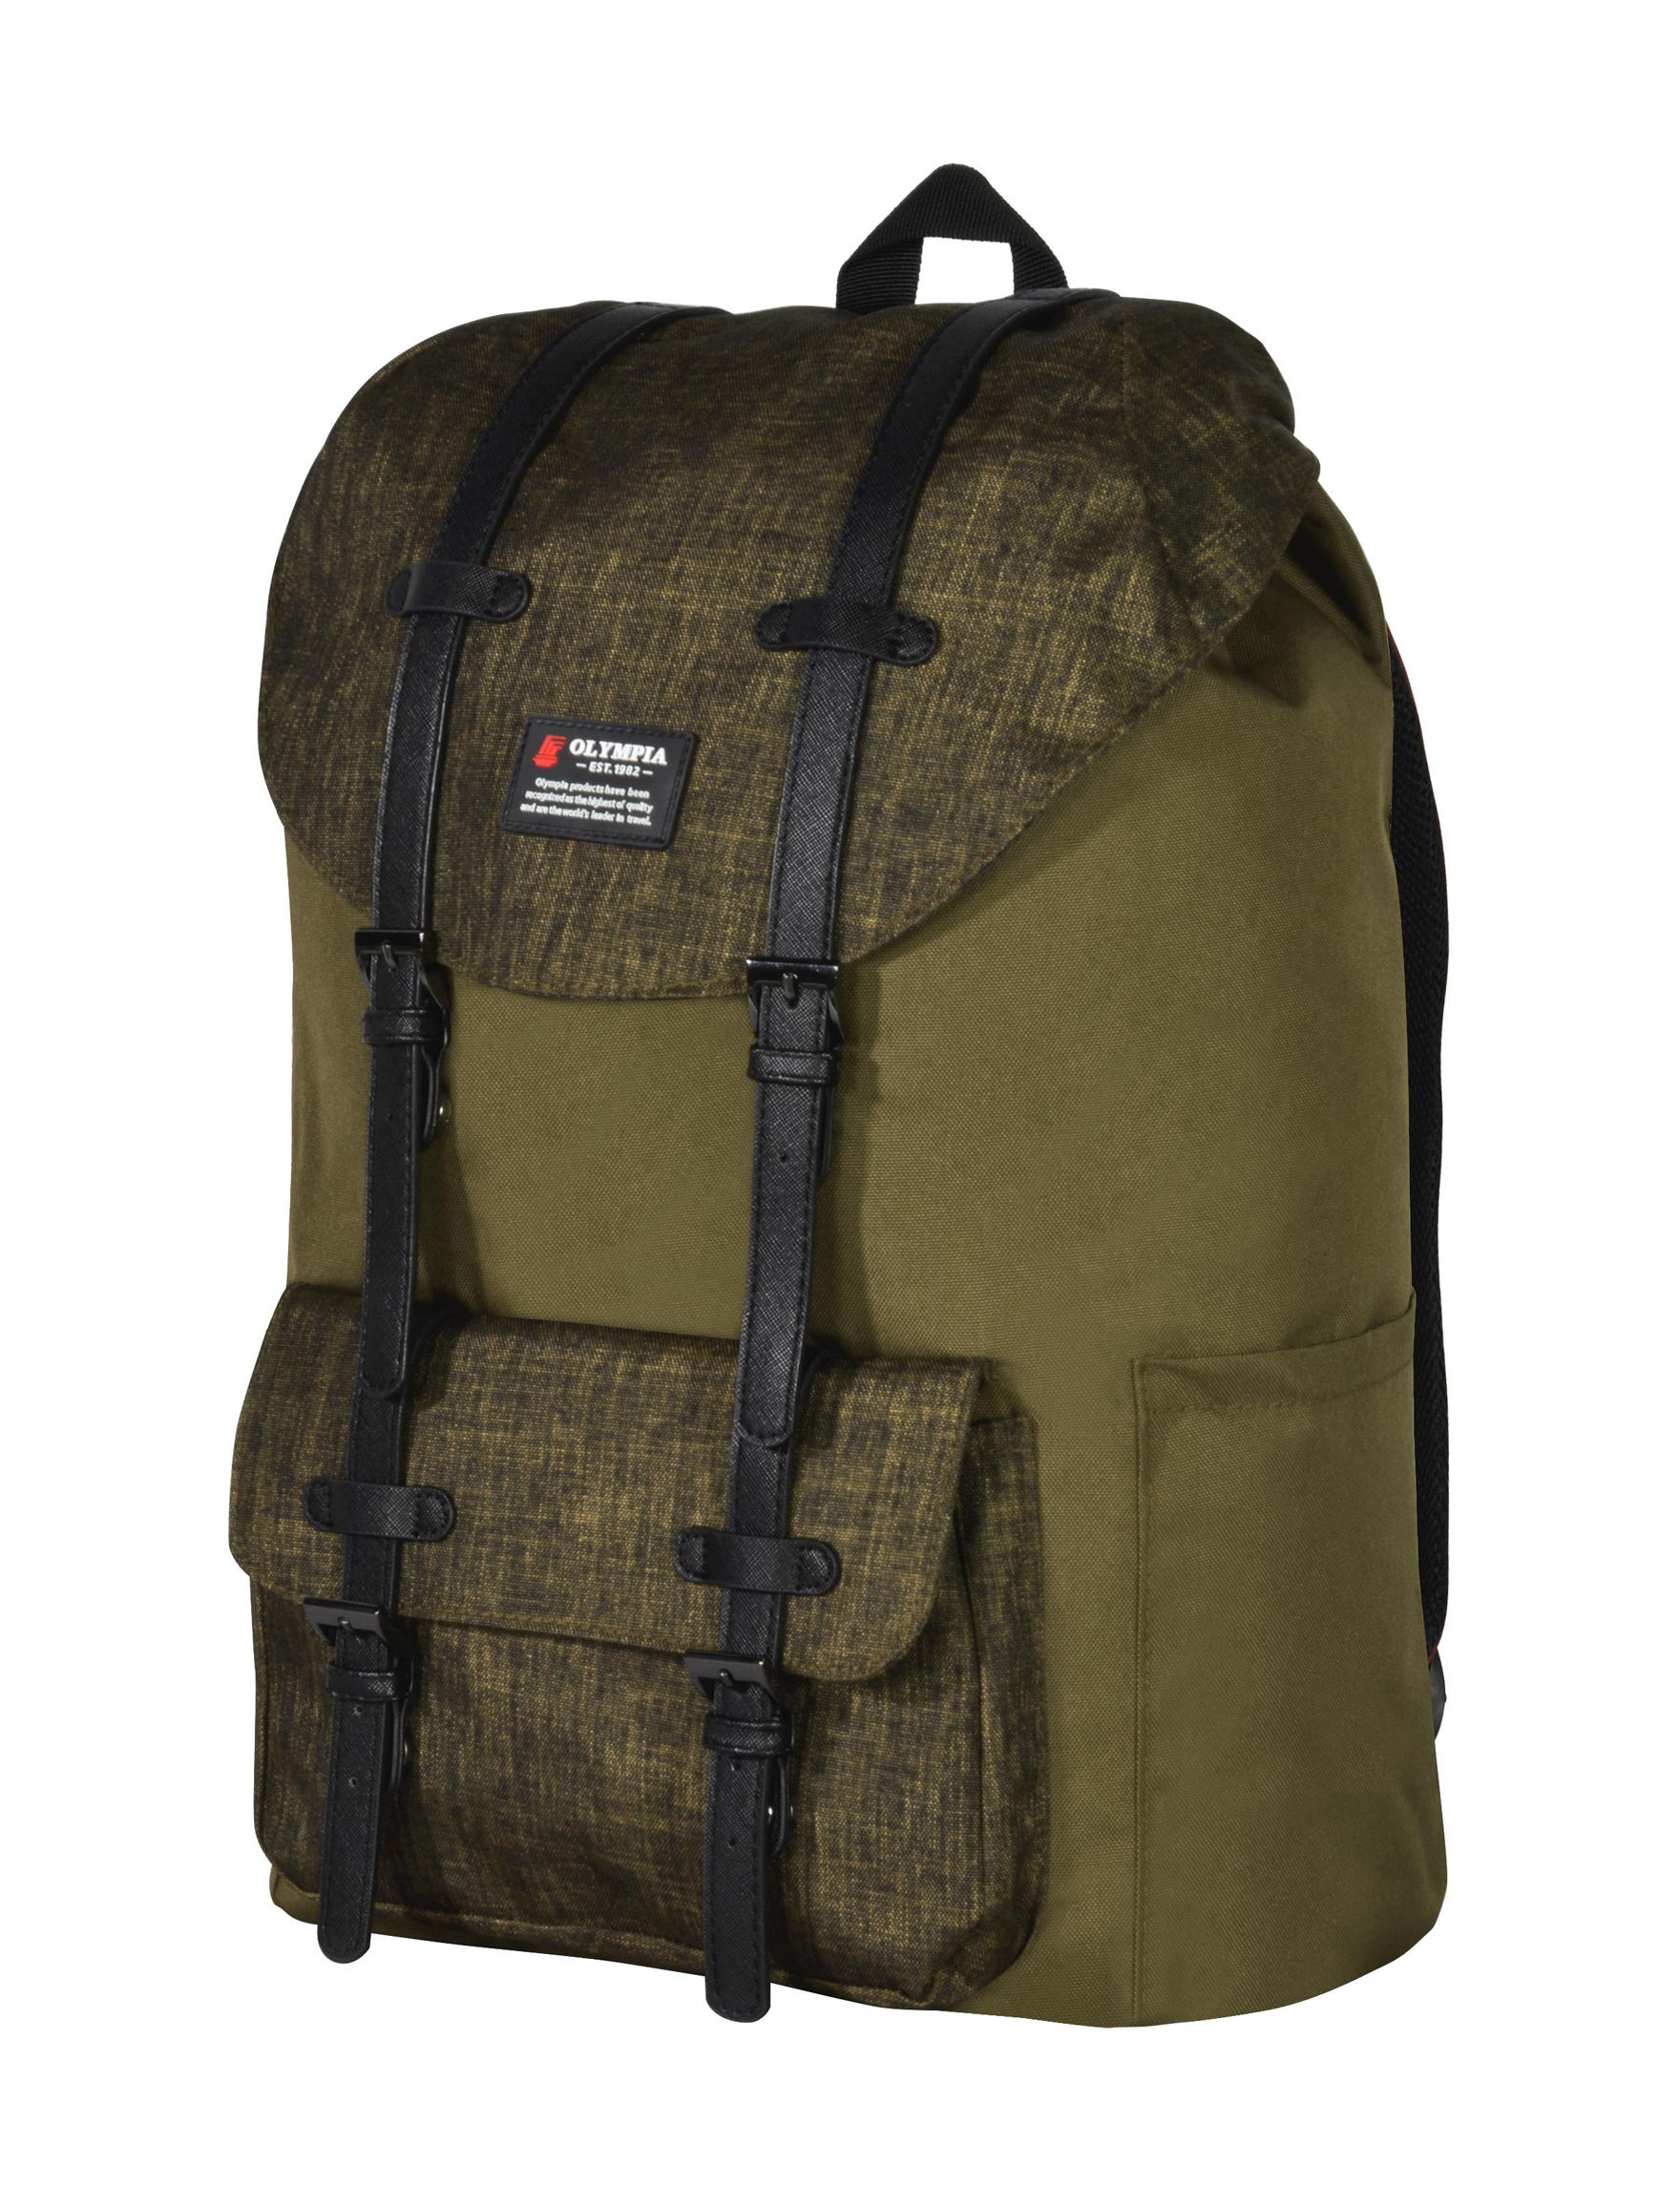 Olympia Green Bookbags & Backpacks